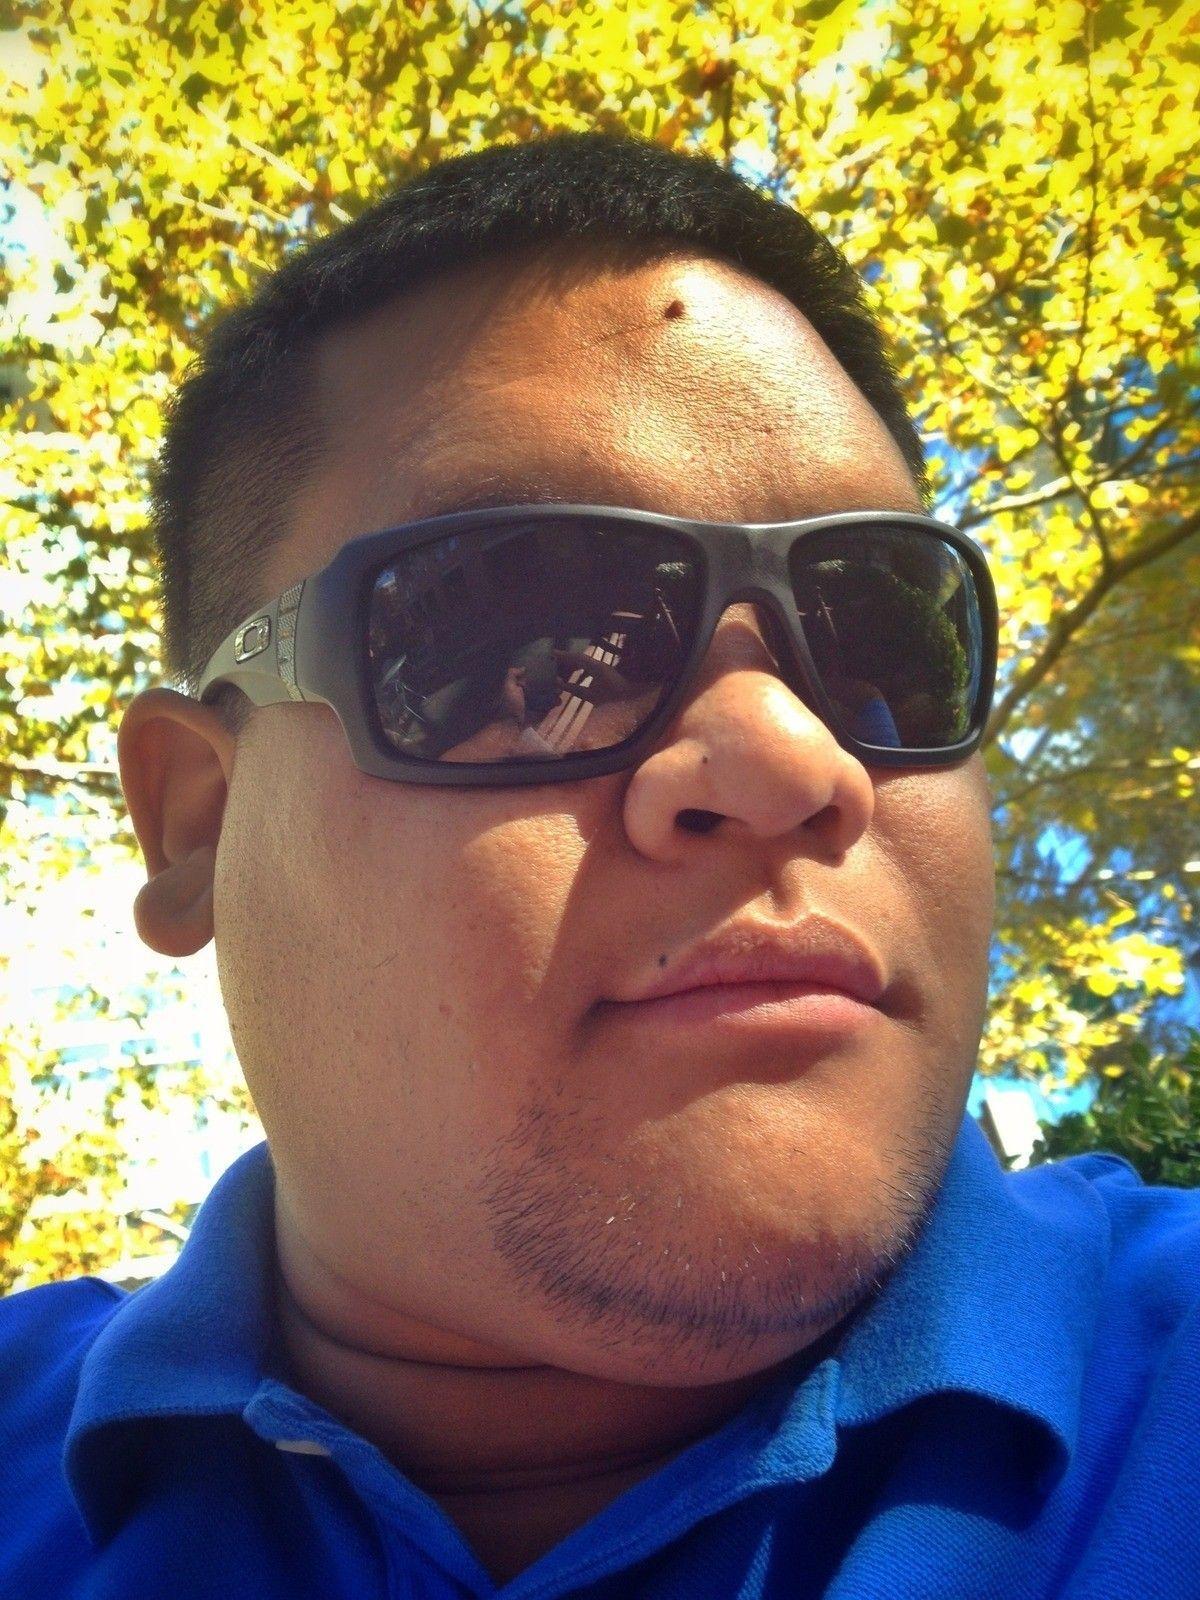 804a3801286 Oakley Sunglasses Bald Head Cfa Vauban Du Bâtiment